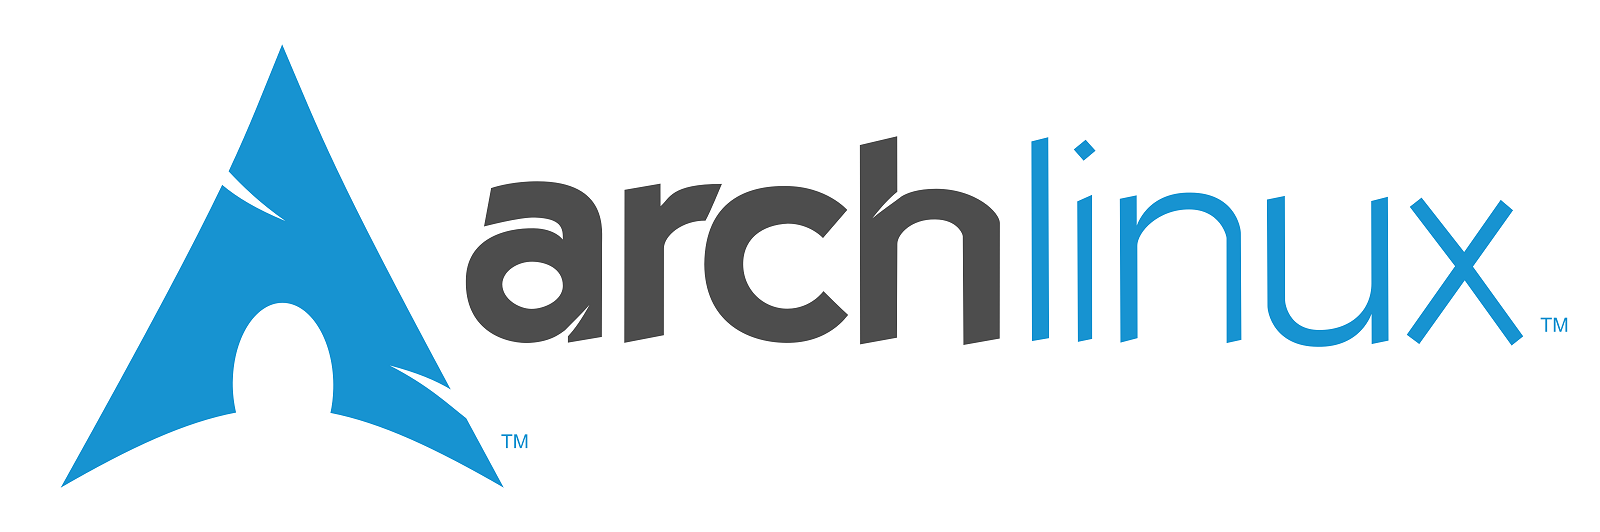 archlinux-logo-dark-1200dpi.png